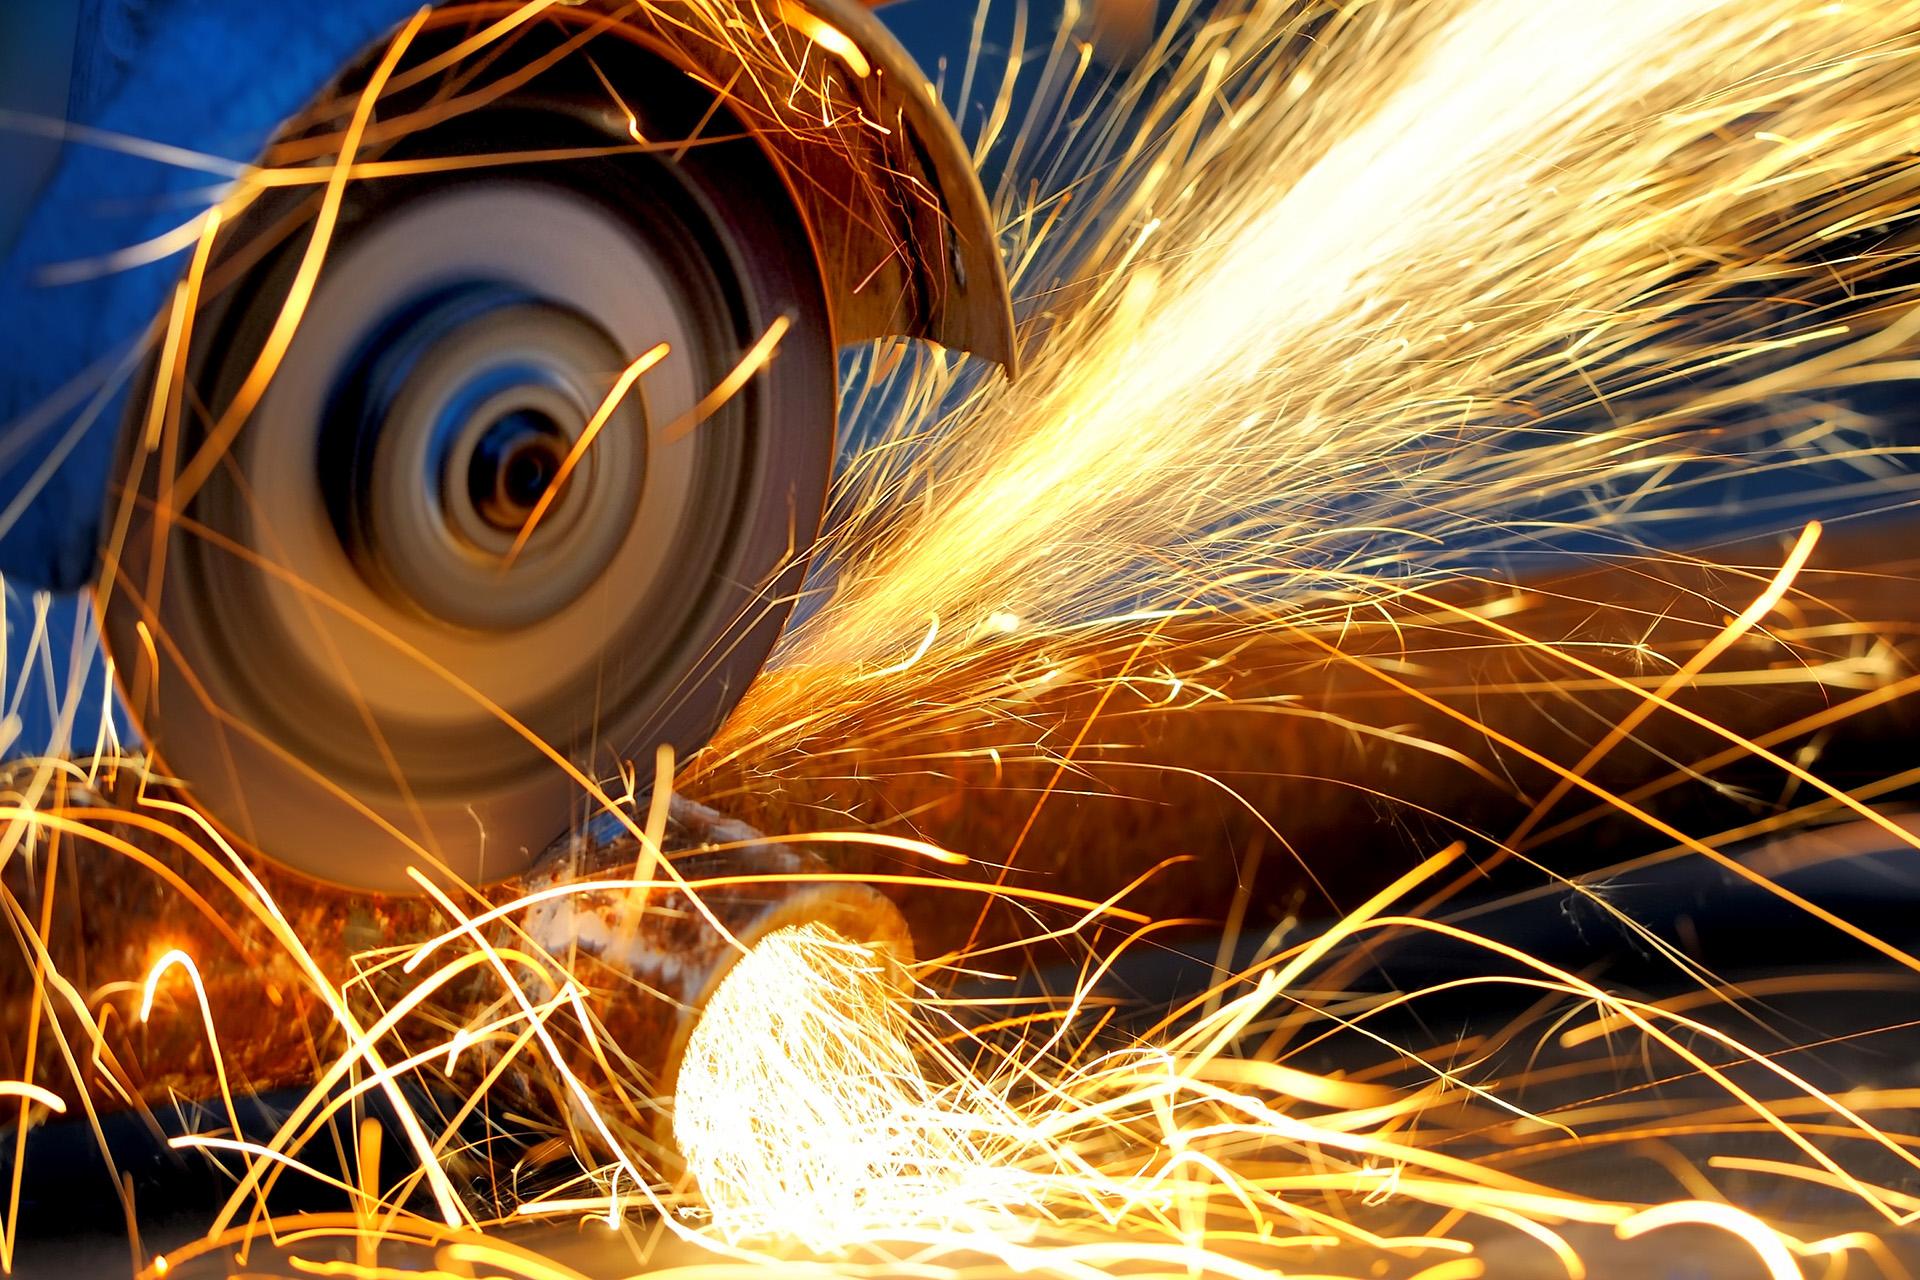 Industrial equipment grinder